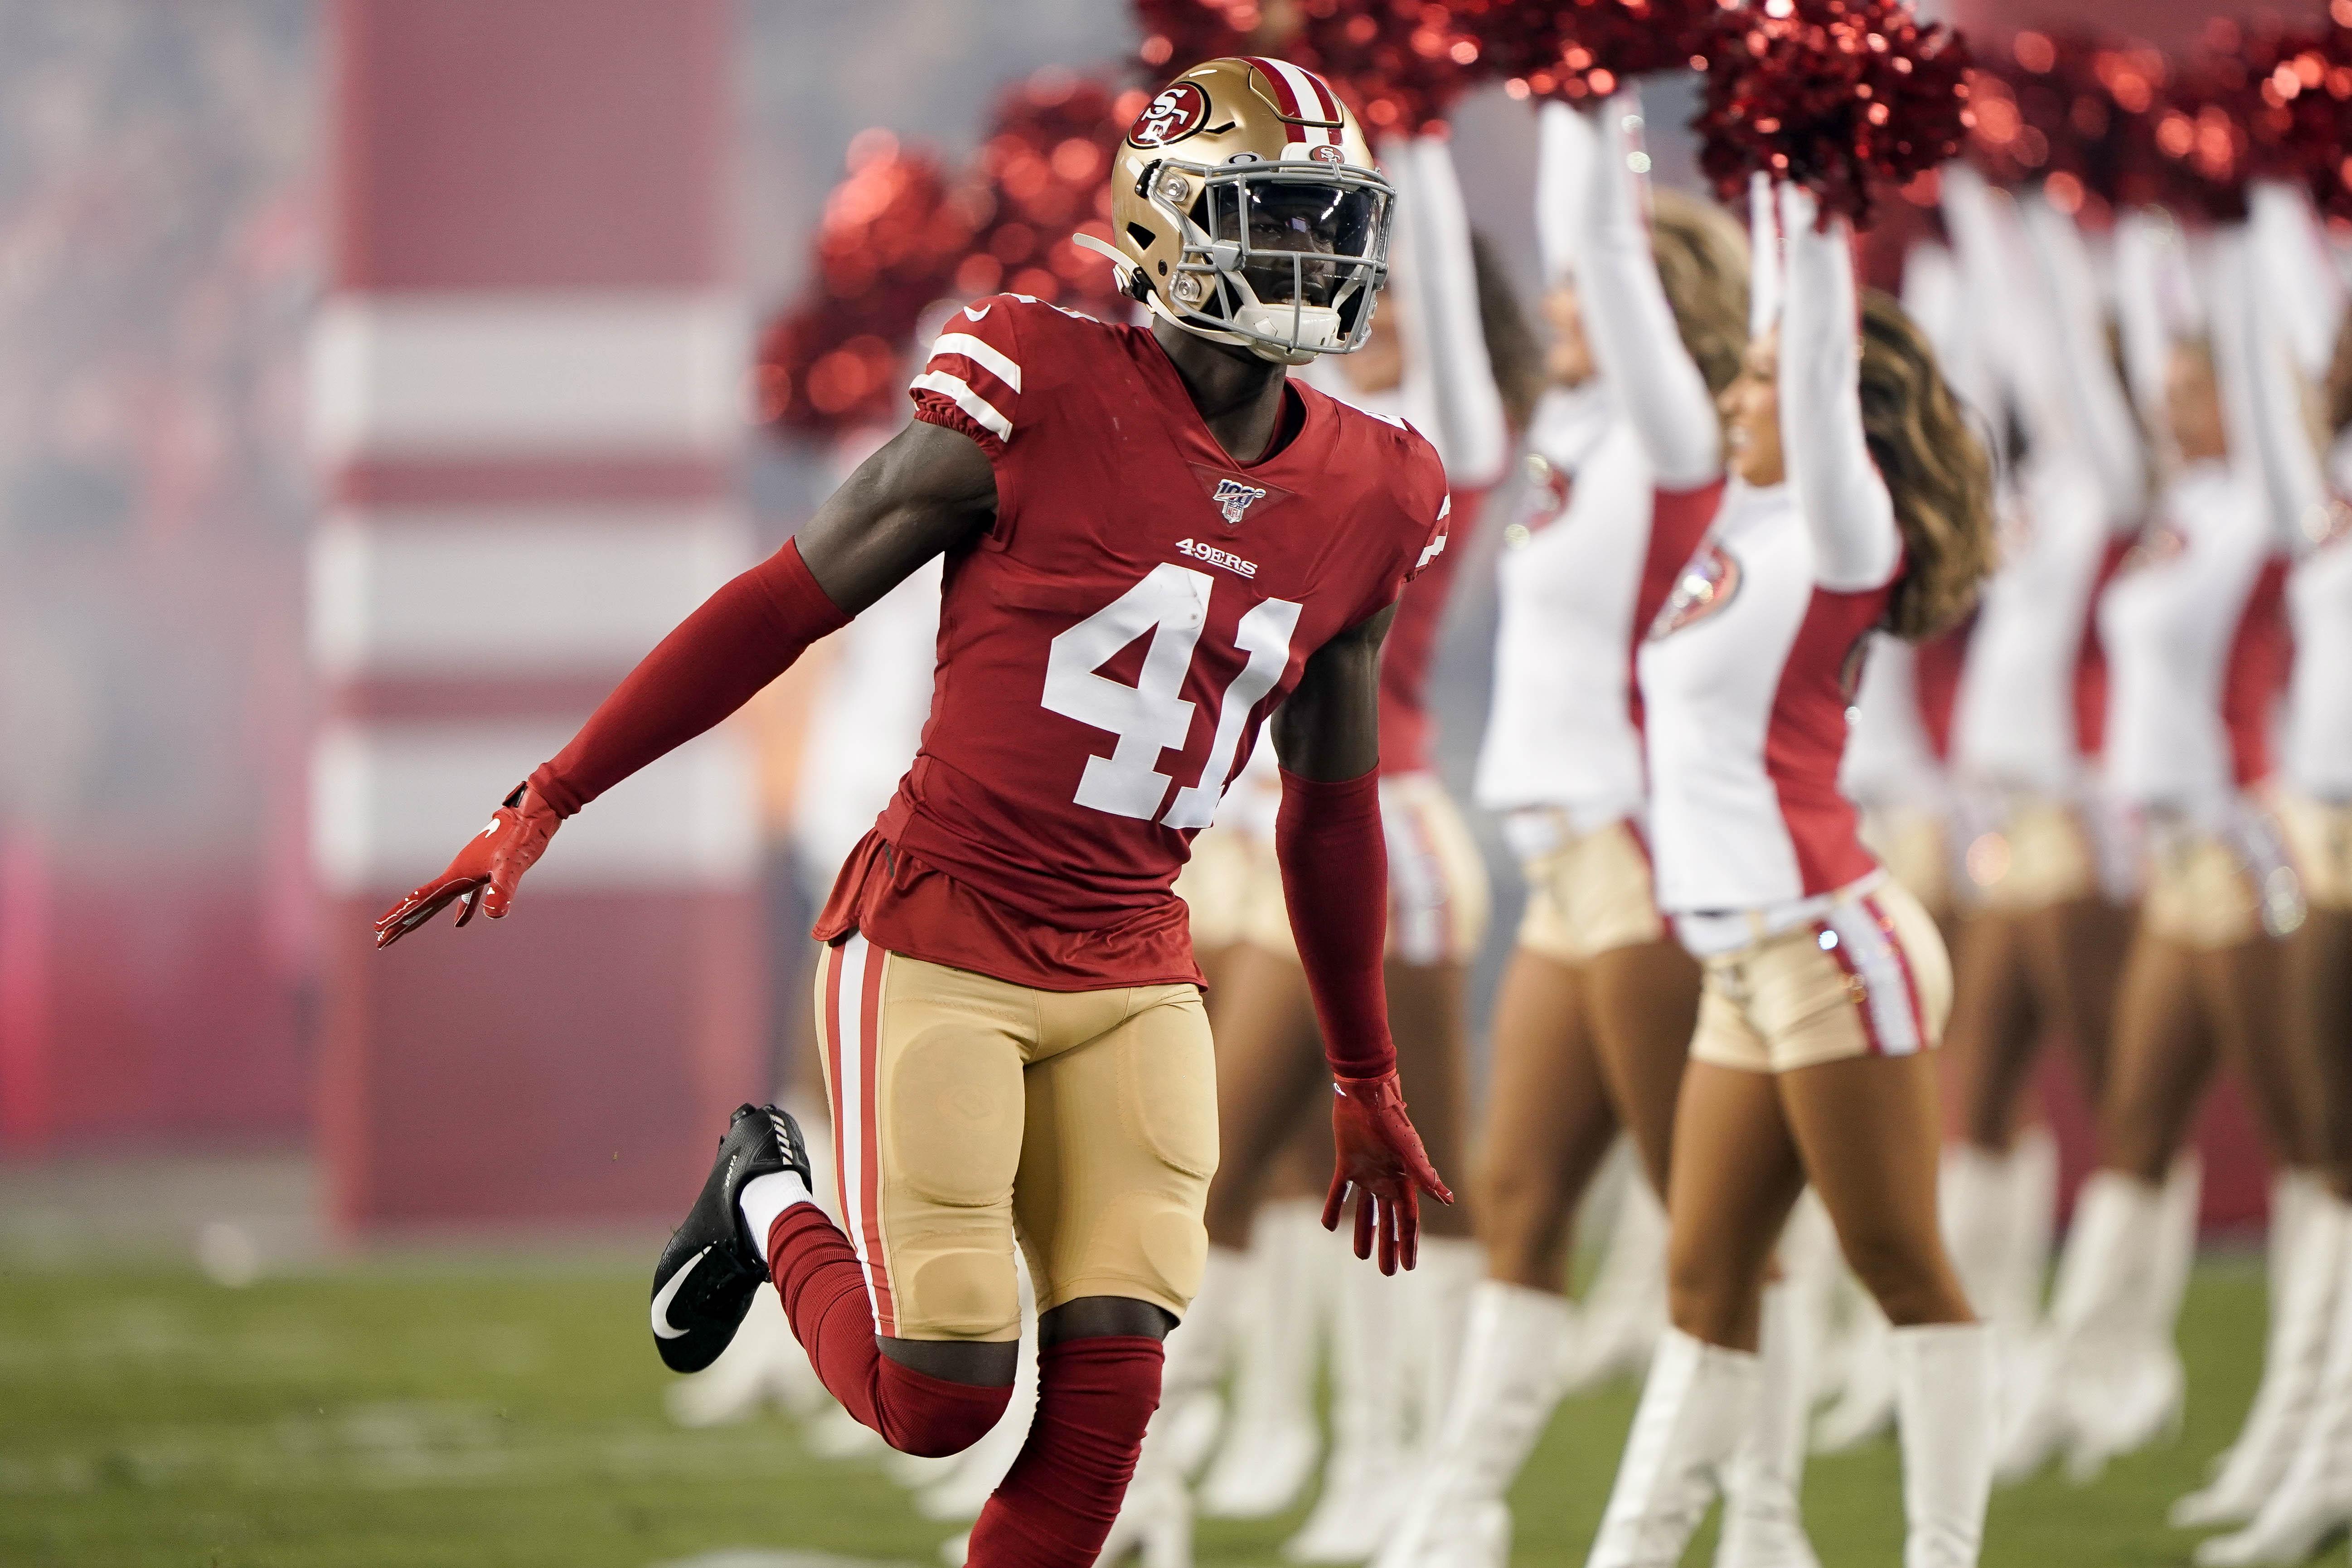 NFL: Green Bay Packers at San Francisco 49ers